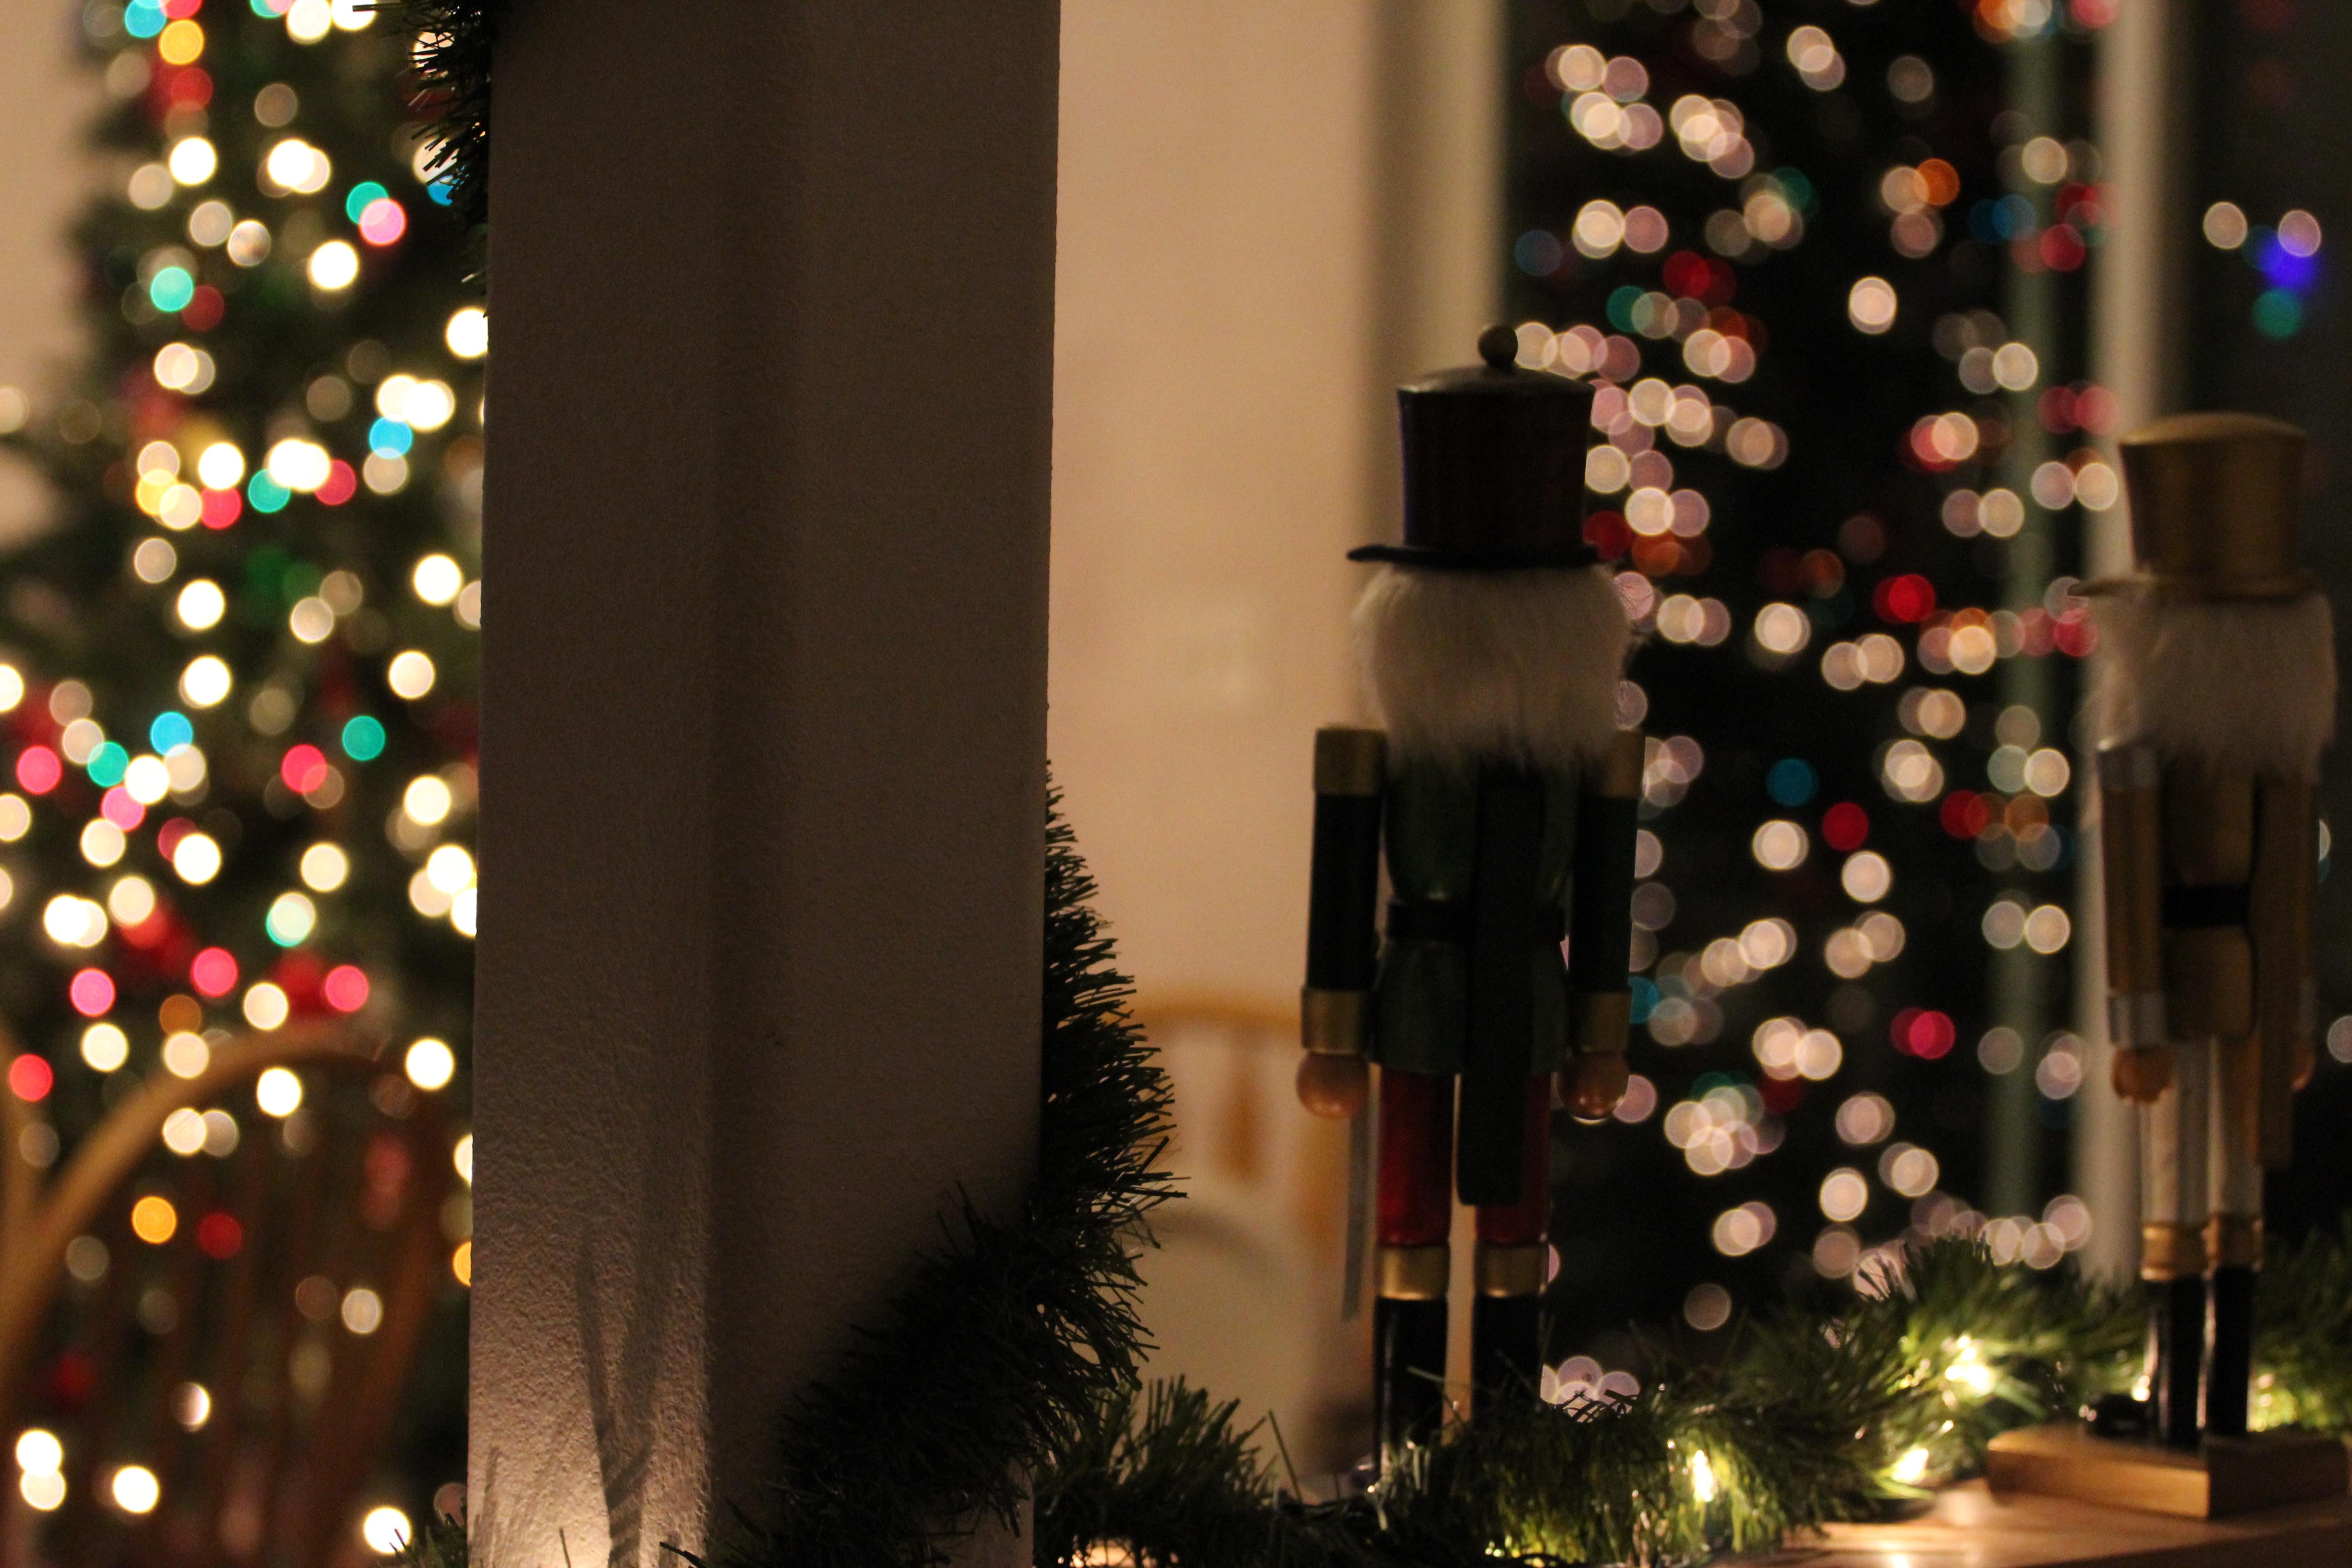 ligero fiesta navidad iluminacin decoracin rbol de navidad diseo de interiores decoracin navidea evento floristera luces